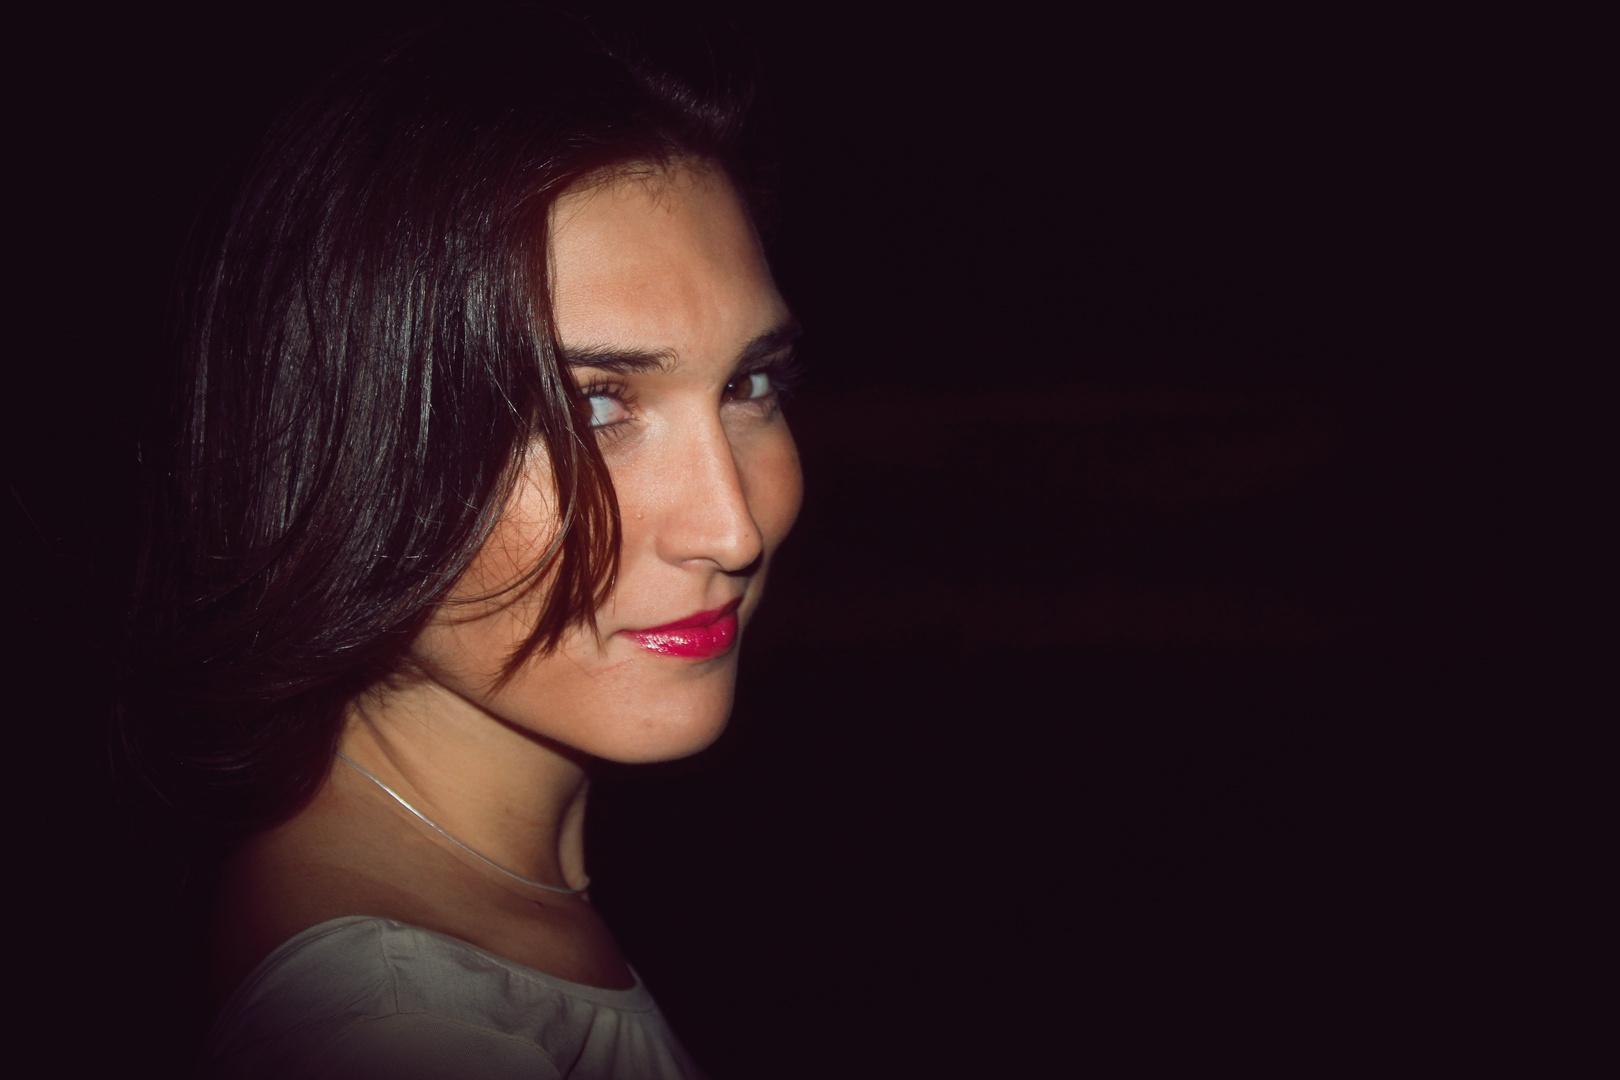 belleza nocturna 2